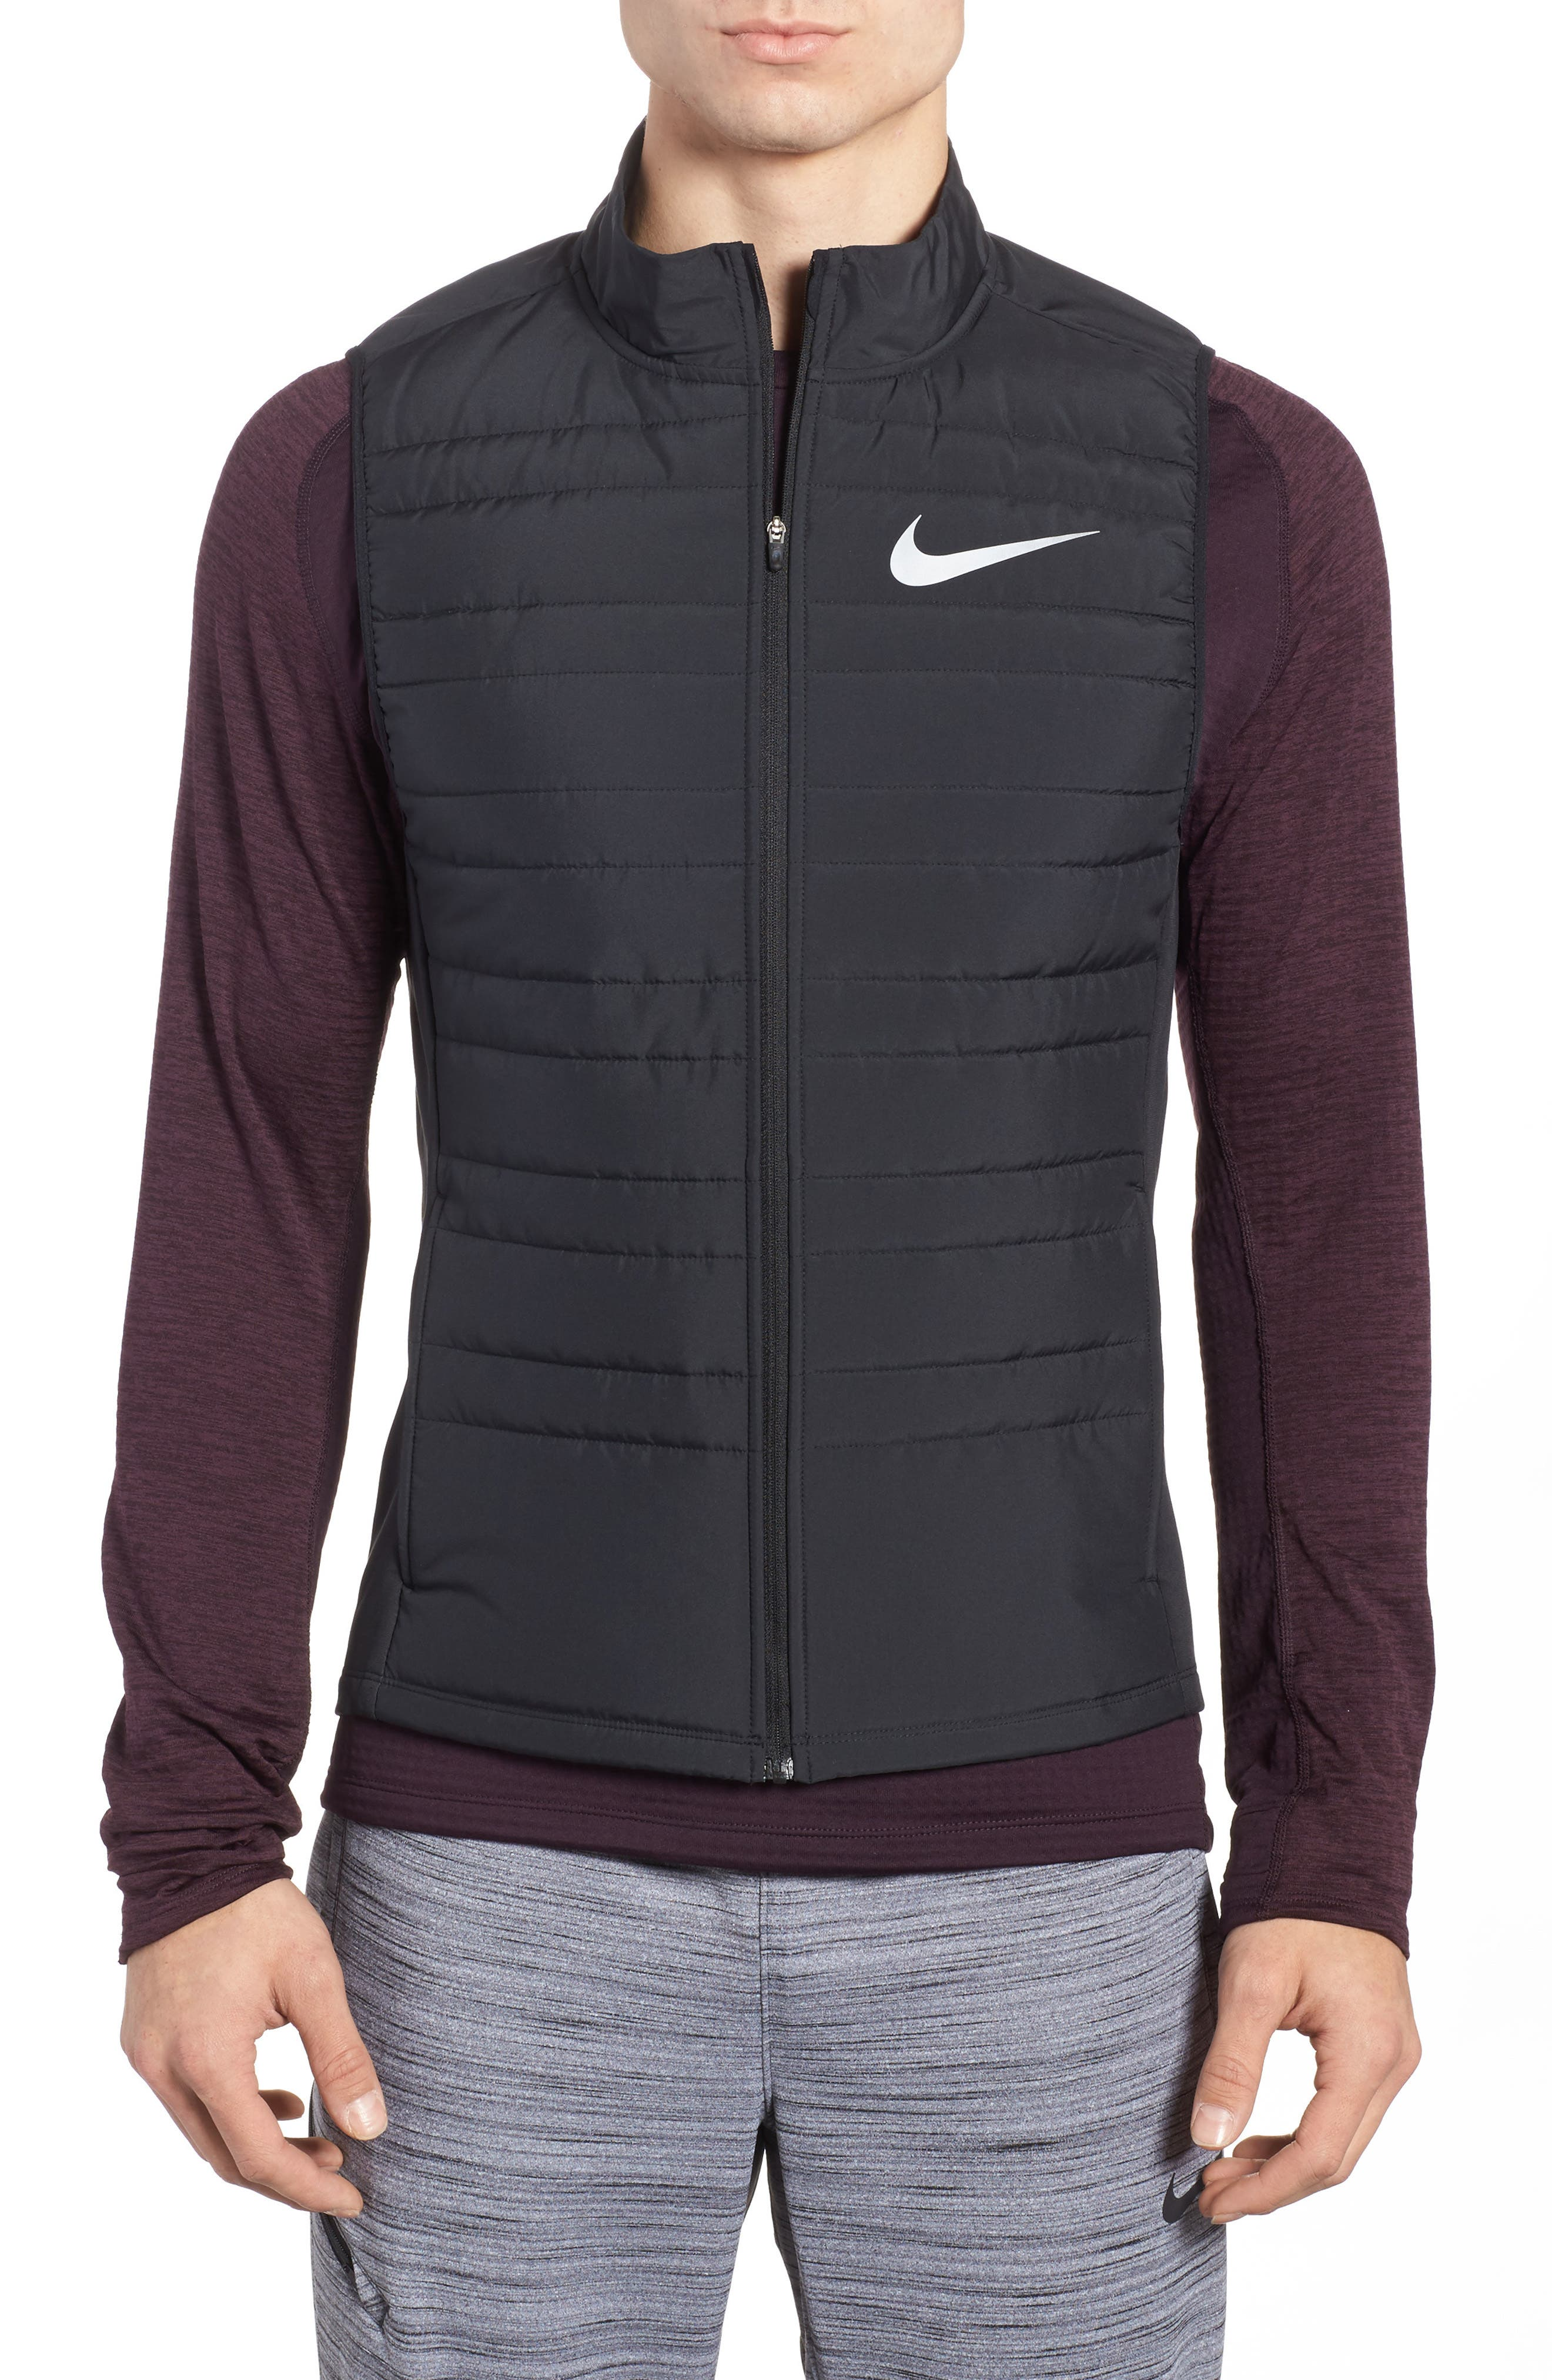 Essential Running Vest,                         Main,                         color, Black/ Black/ Metallic Silver